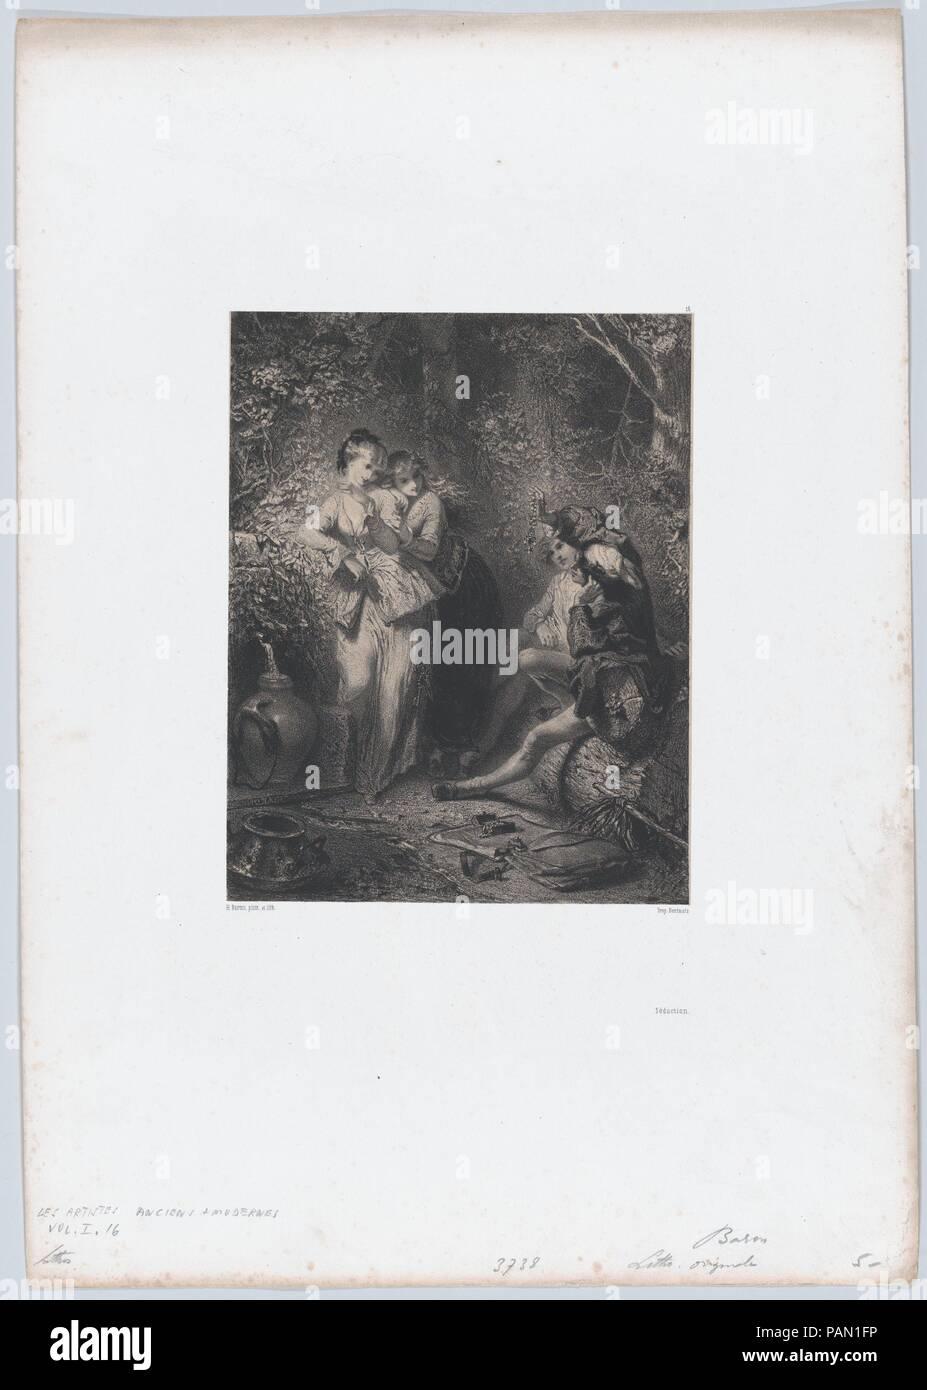 Seduction. Artist: Henri-Charles-Antoine Baron (French, Besançon 1816-1885 Geneva). Dimensions: Sheet: 17 5/8 × 12 5/16 in. (44.8 × 31.3 cm)  Image: 8 1/8 × 6 3/8 in. (20.7 × 16.2 cm). Printer: Bertauts. Series/Portfolio: Les Artistes Anciens et Modernes. Date: 1850. Museum: Metropolitan Museum of Art, New York, USA. - Stock Image